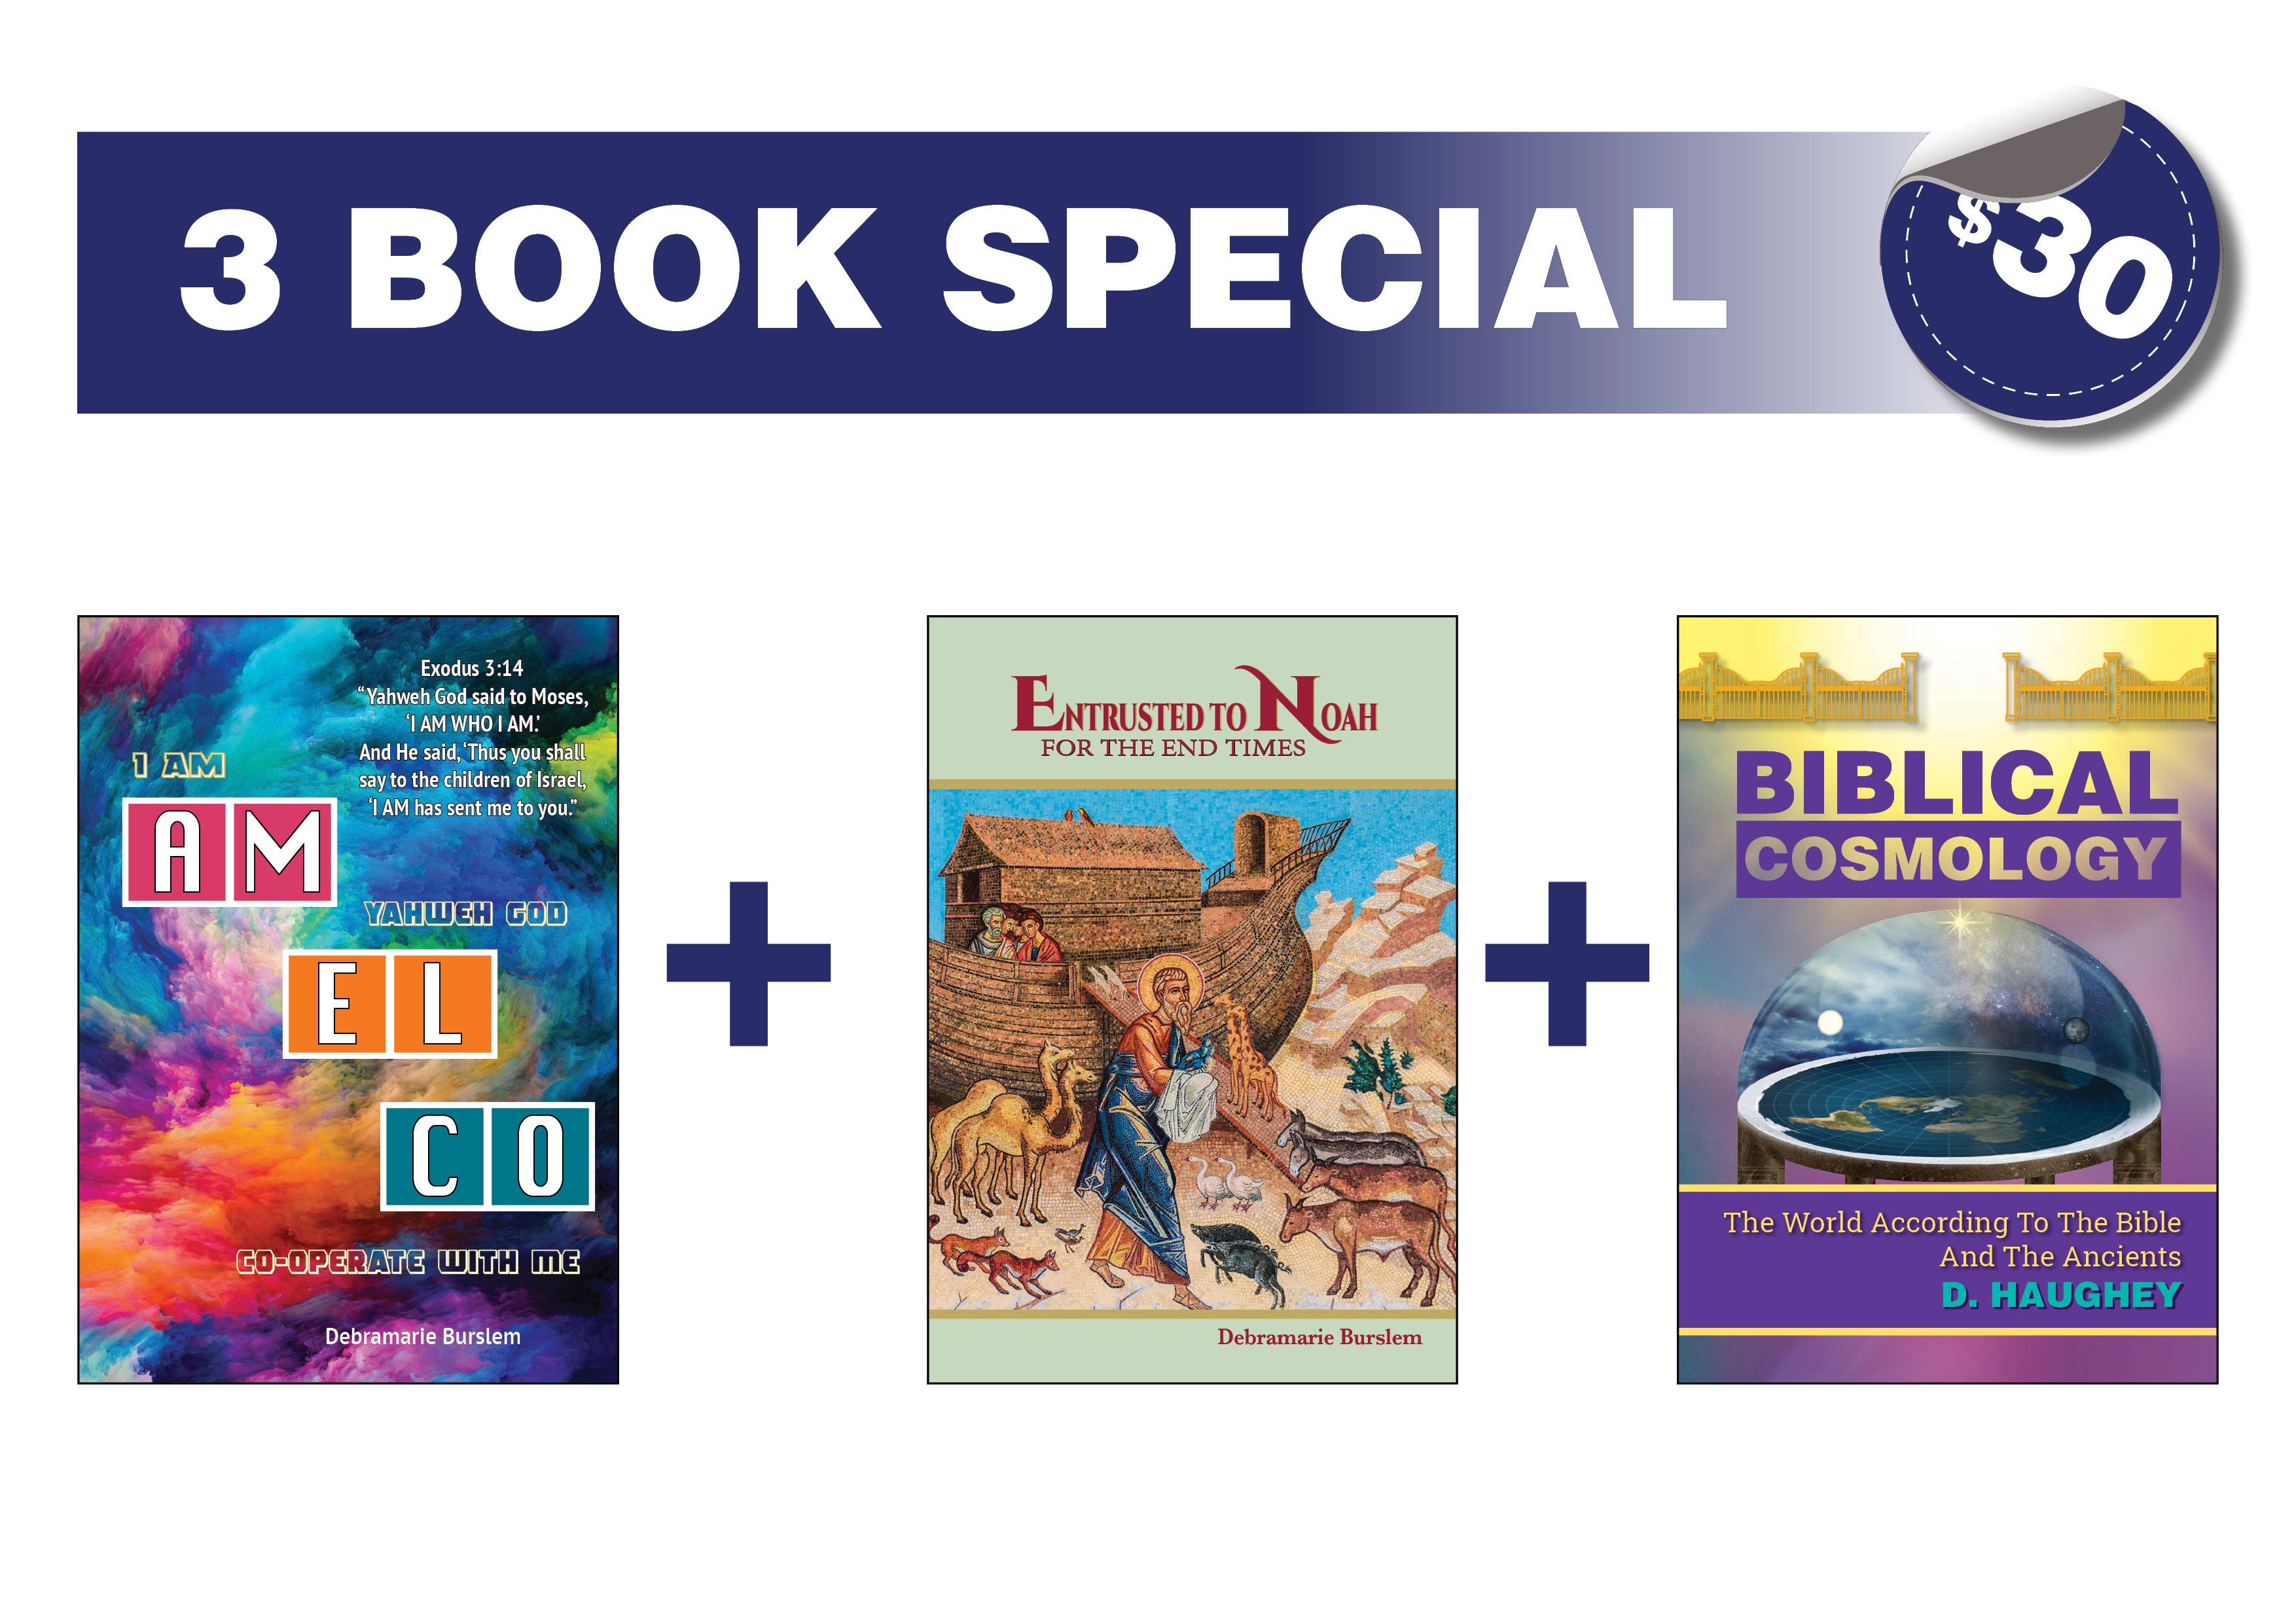 3 Book Special 10489